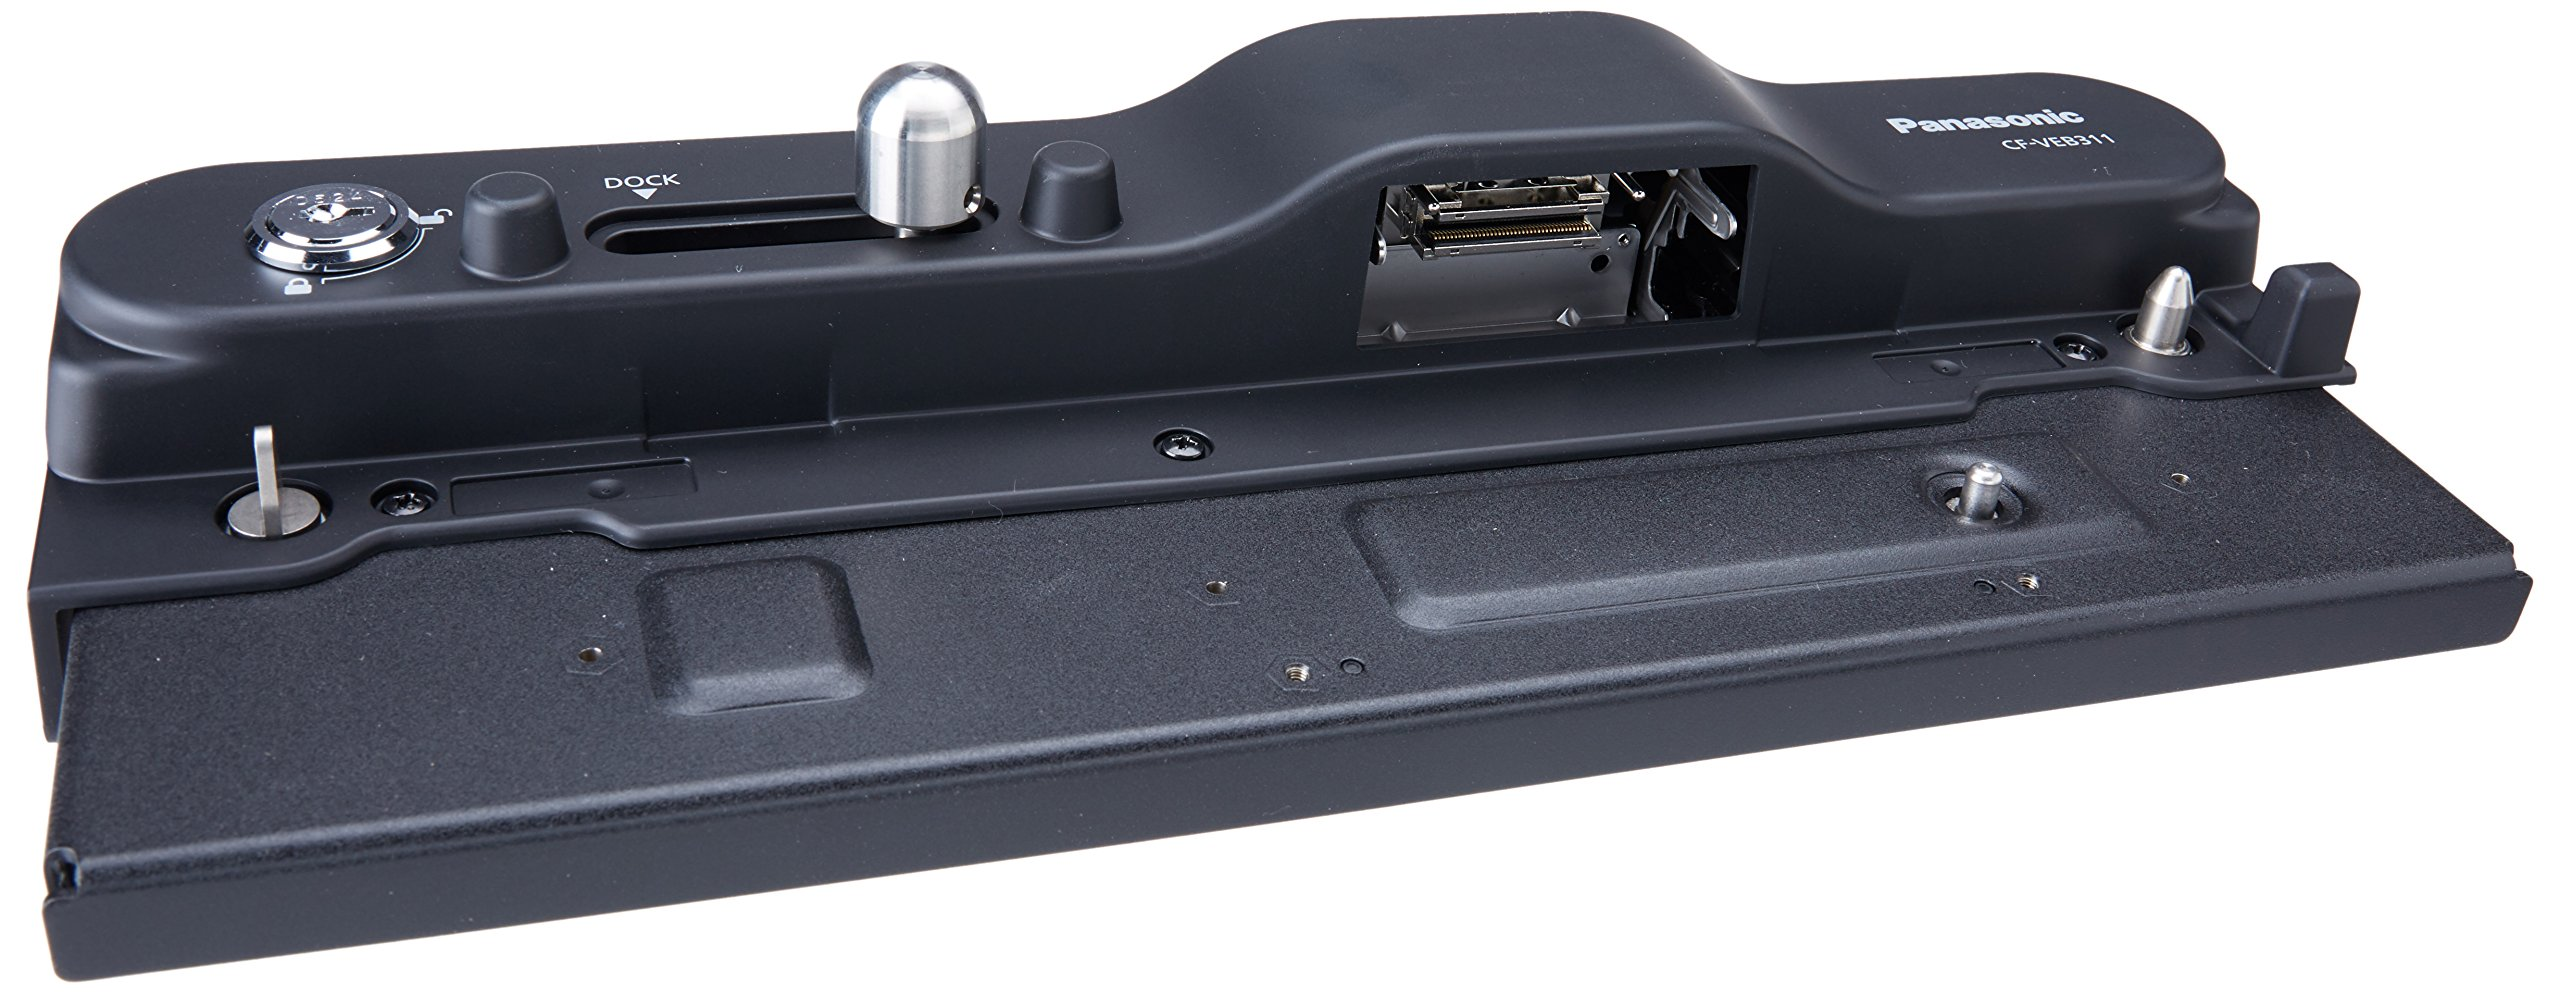 Desktop Port Replicator for CF-31 by Panasonic (Image #1)